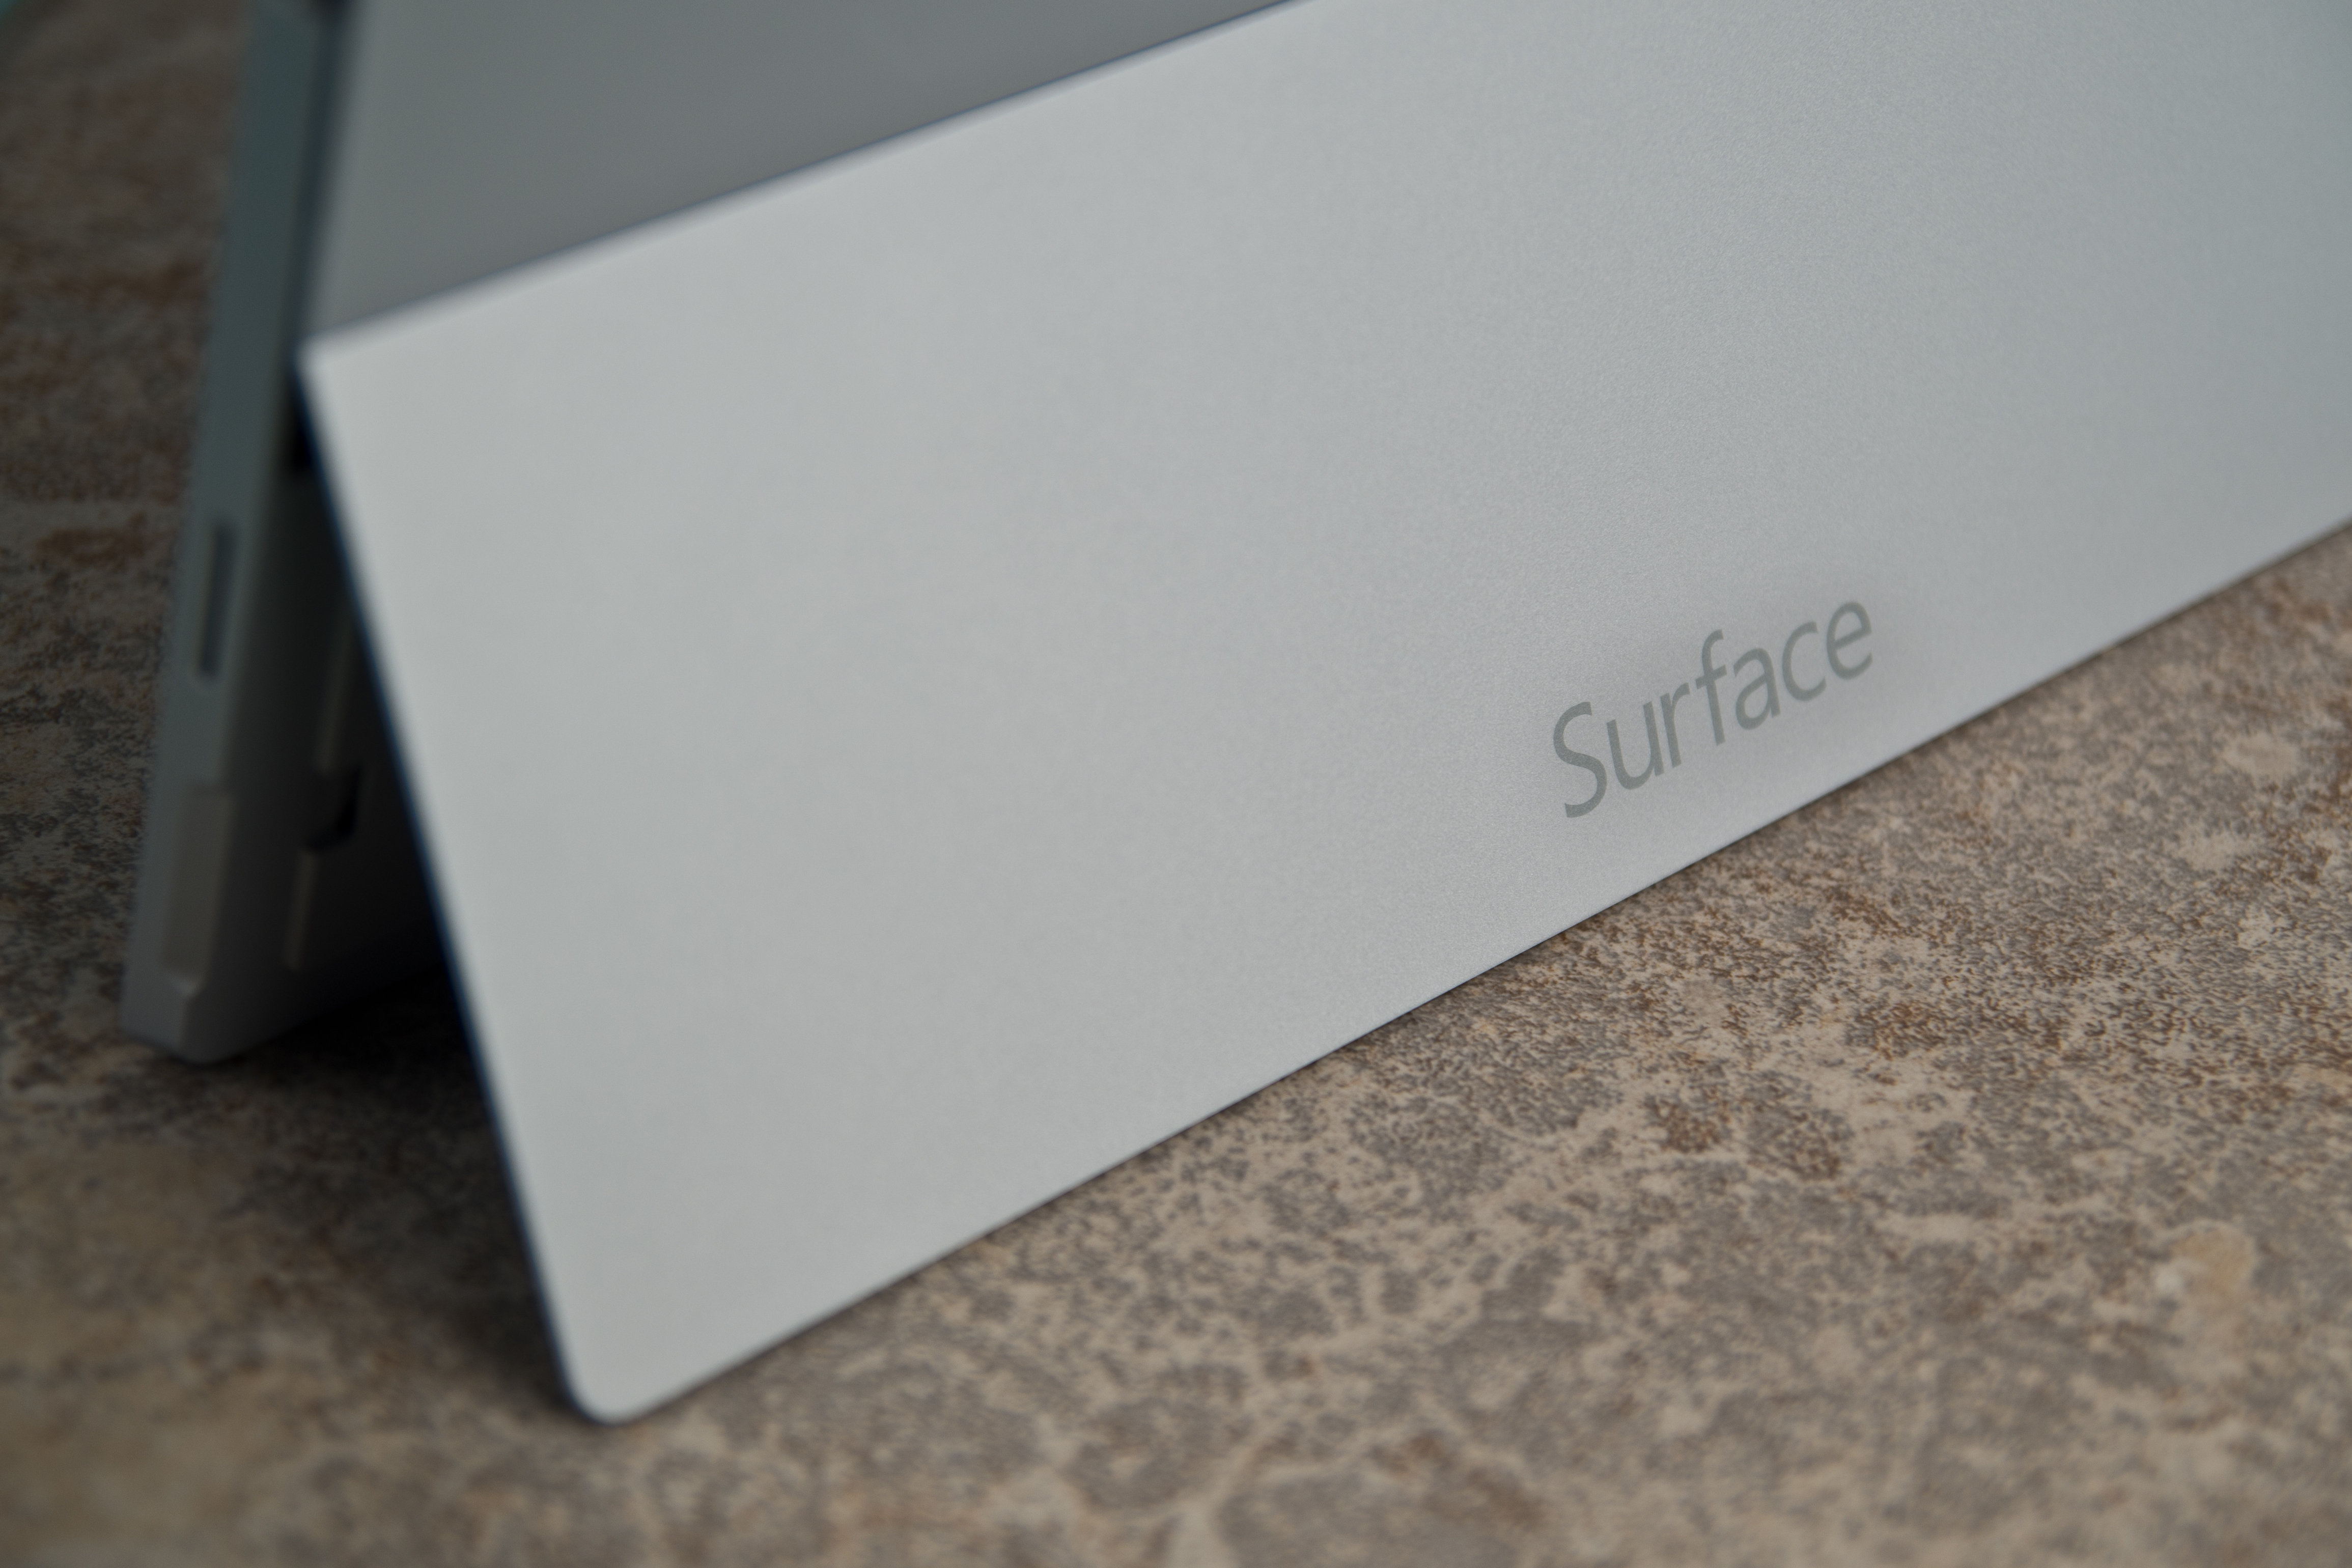 A closer look at the Microsoft Surface Pro 3's kickstand.